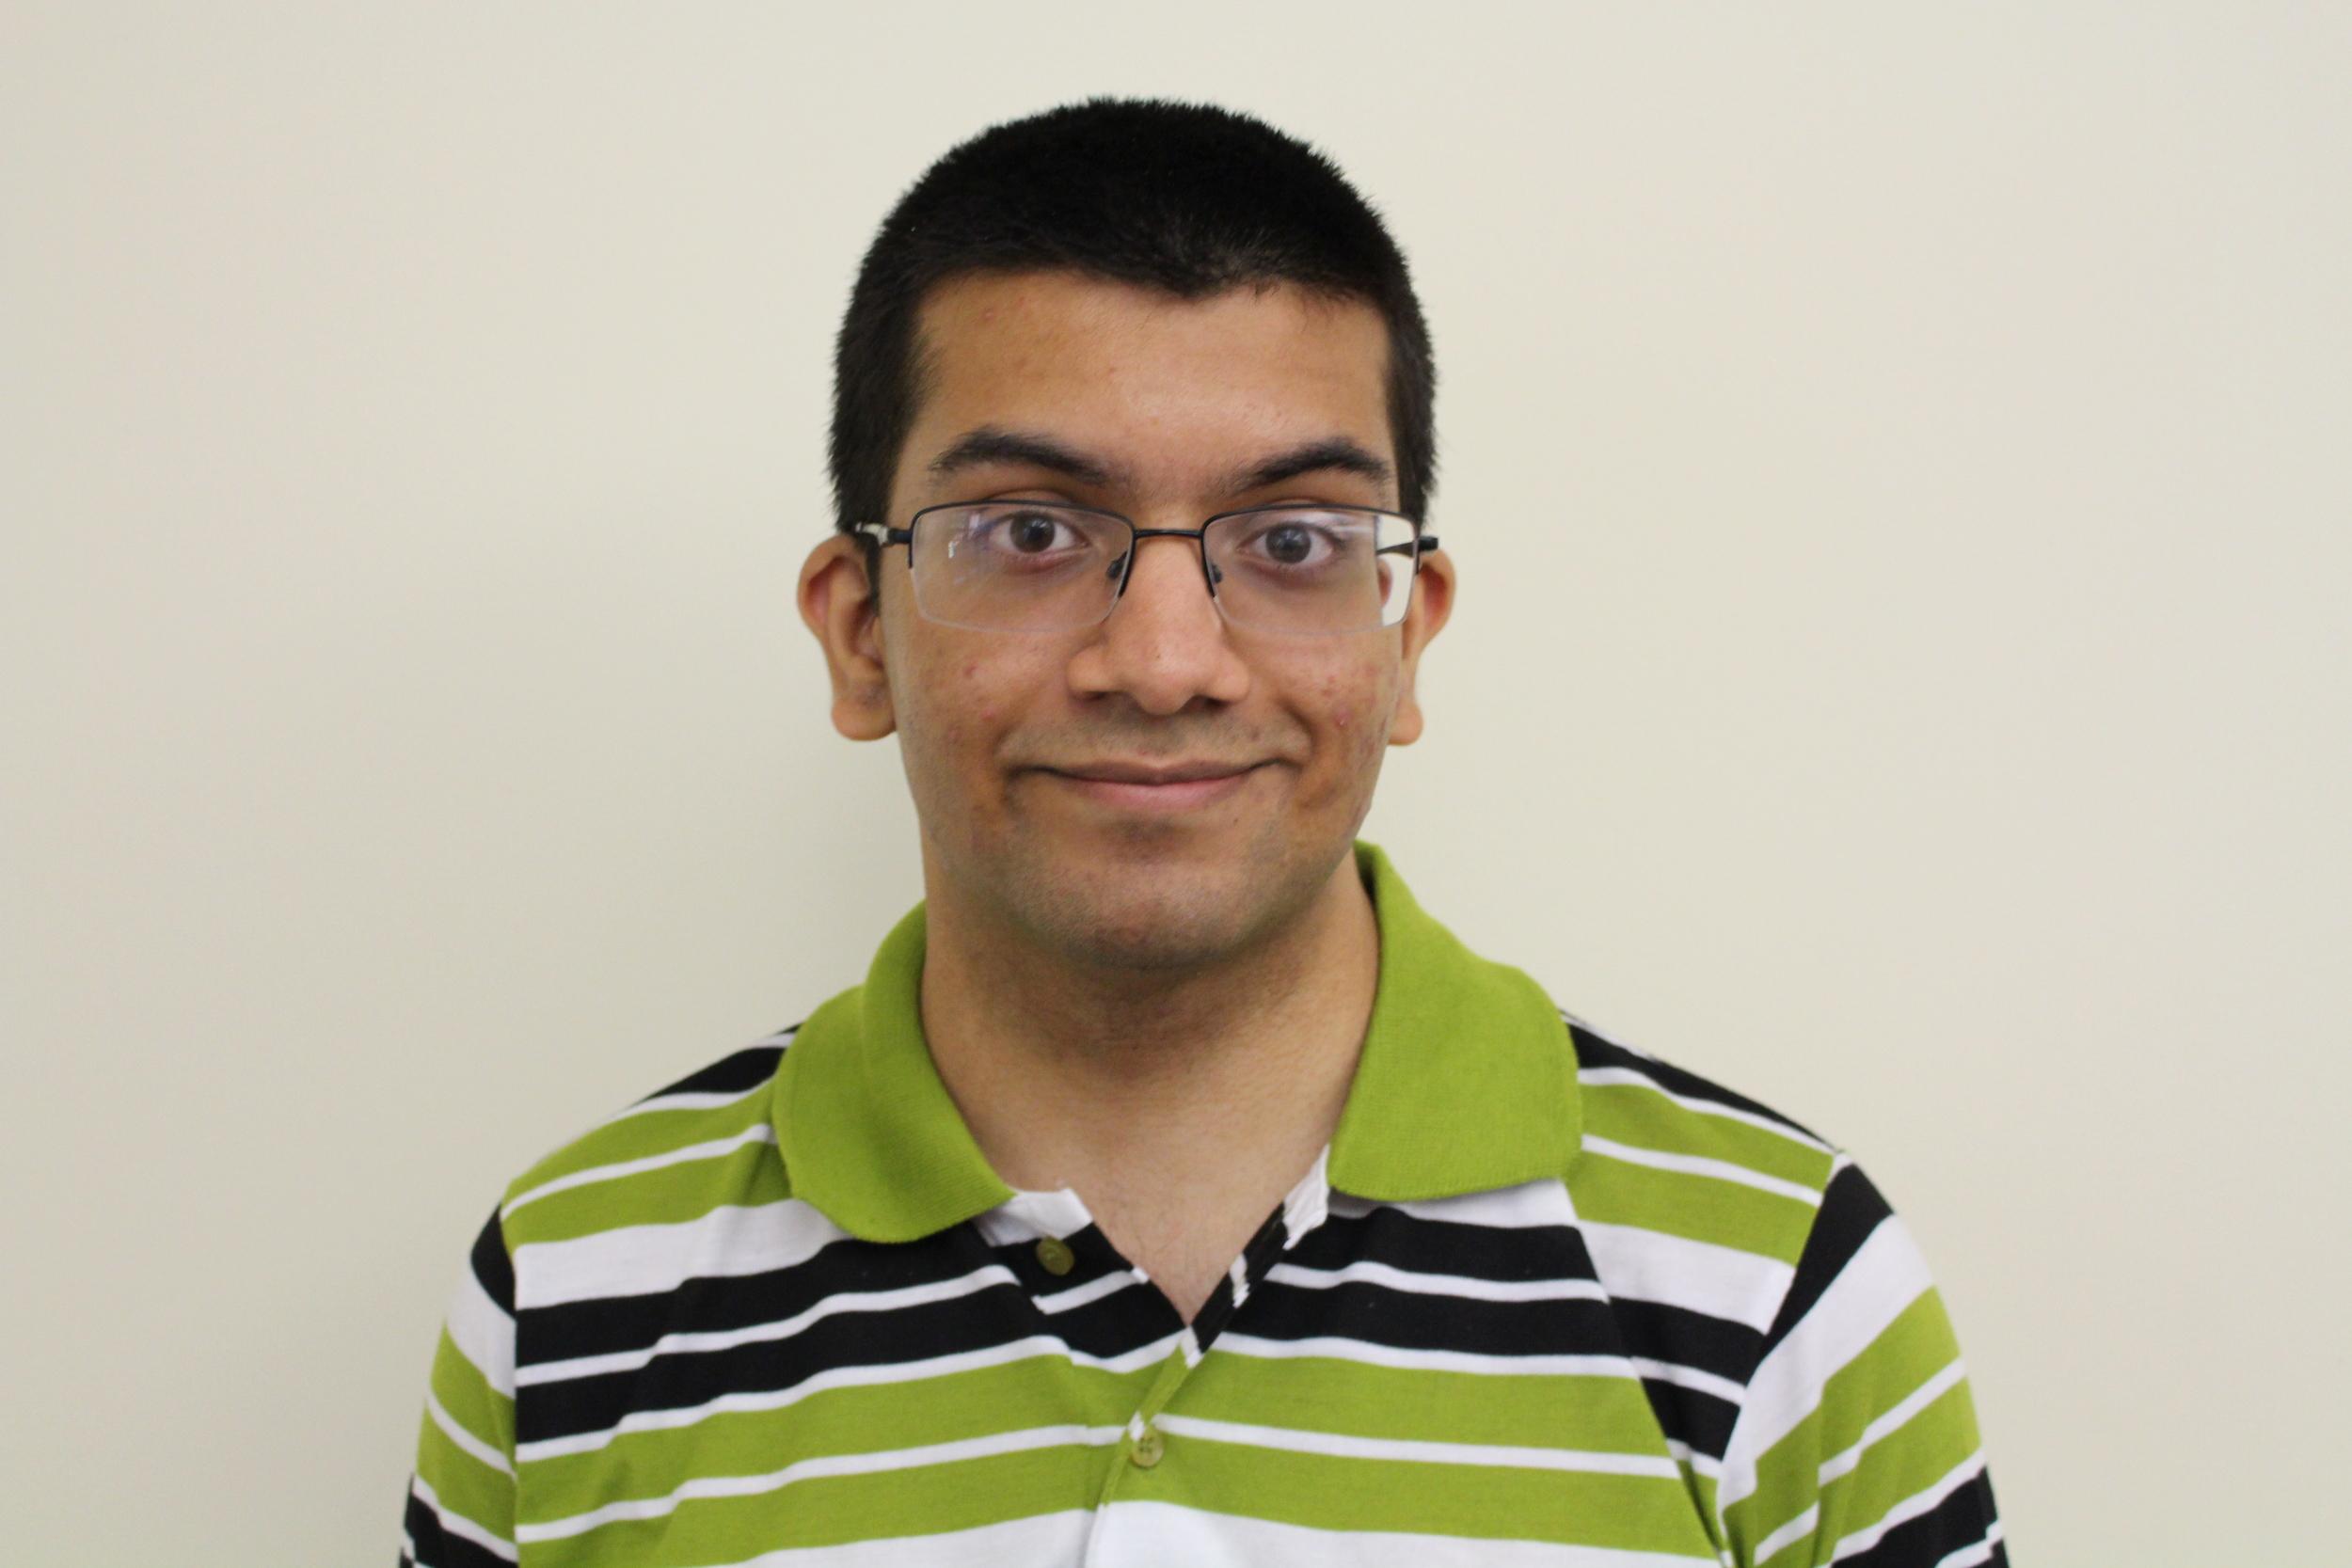 Pranav Padmanabhan , Mentor  Pranav is currently a freshman at   Ohio State University   .